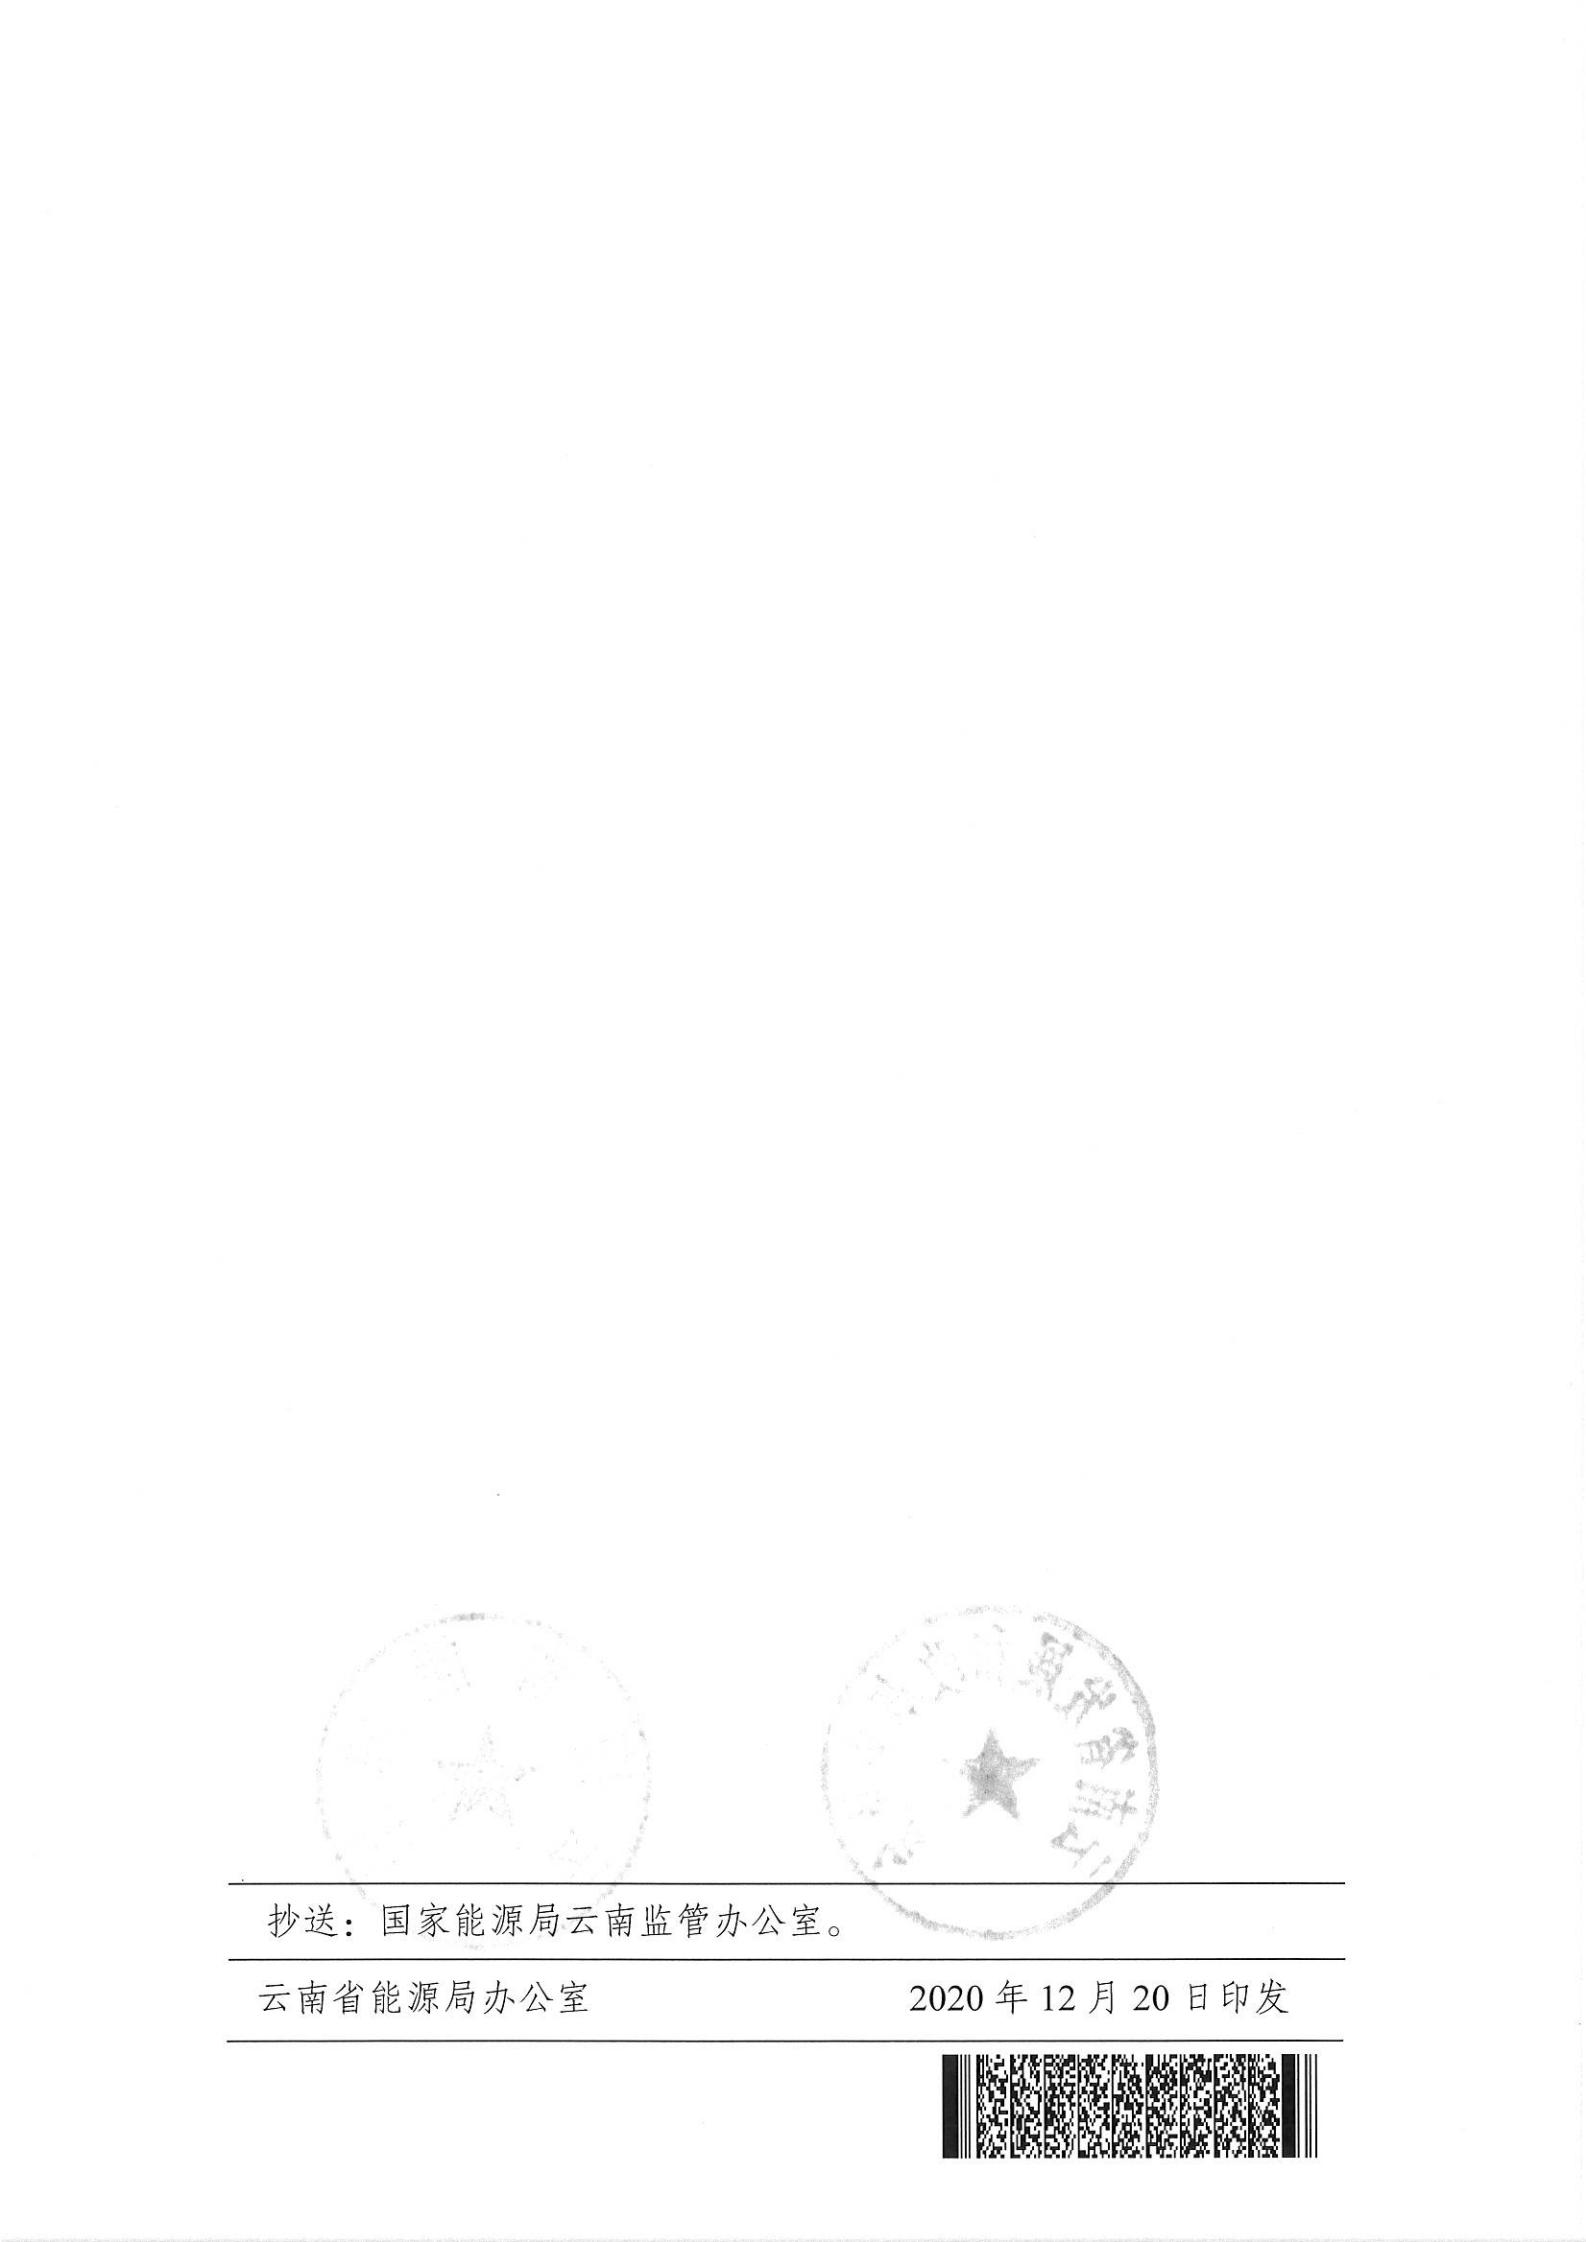 rBcCIV_ho0qAA5TXAASBhs3Agic777.png